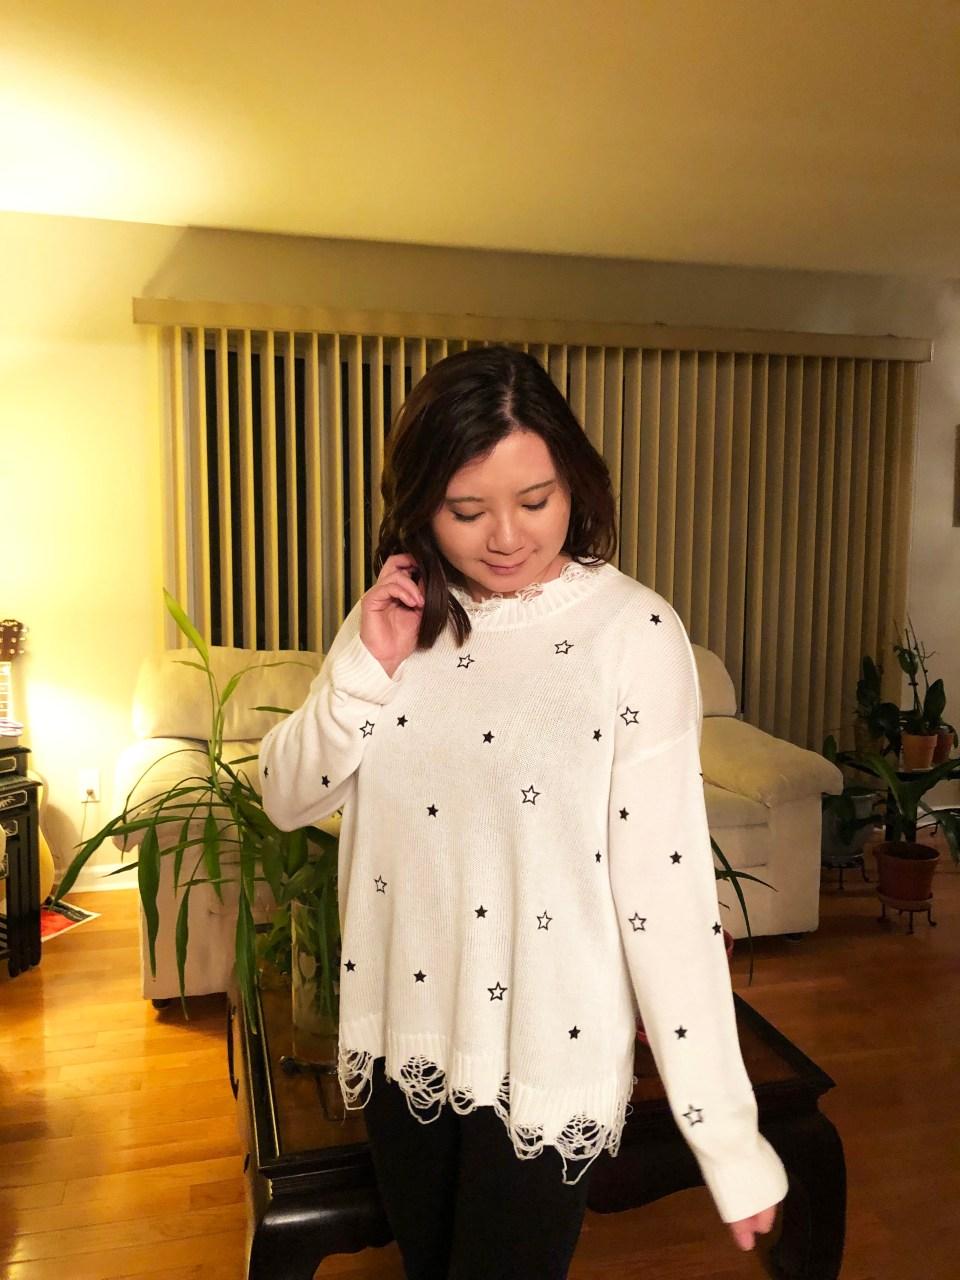 Distressed Star Sweater 4